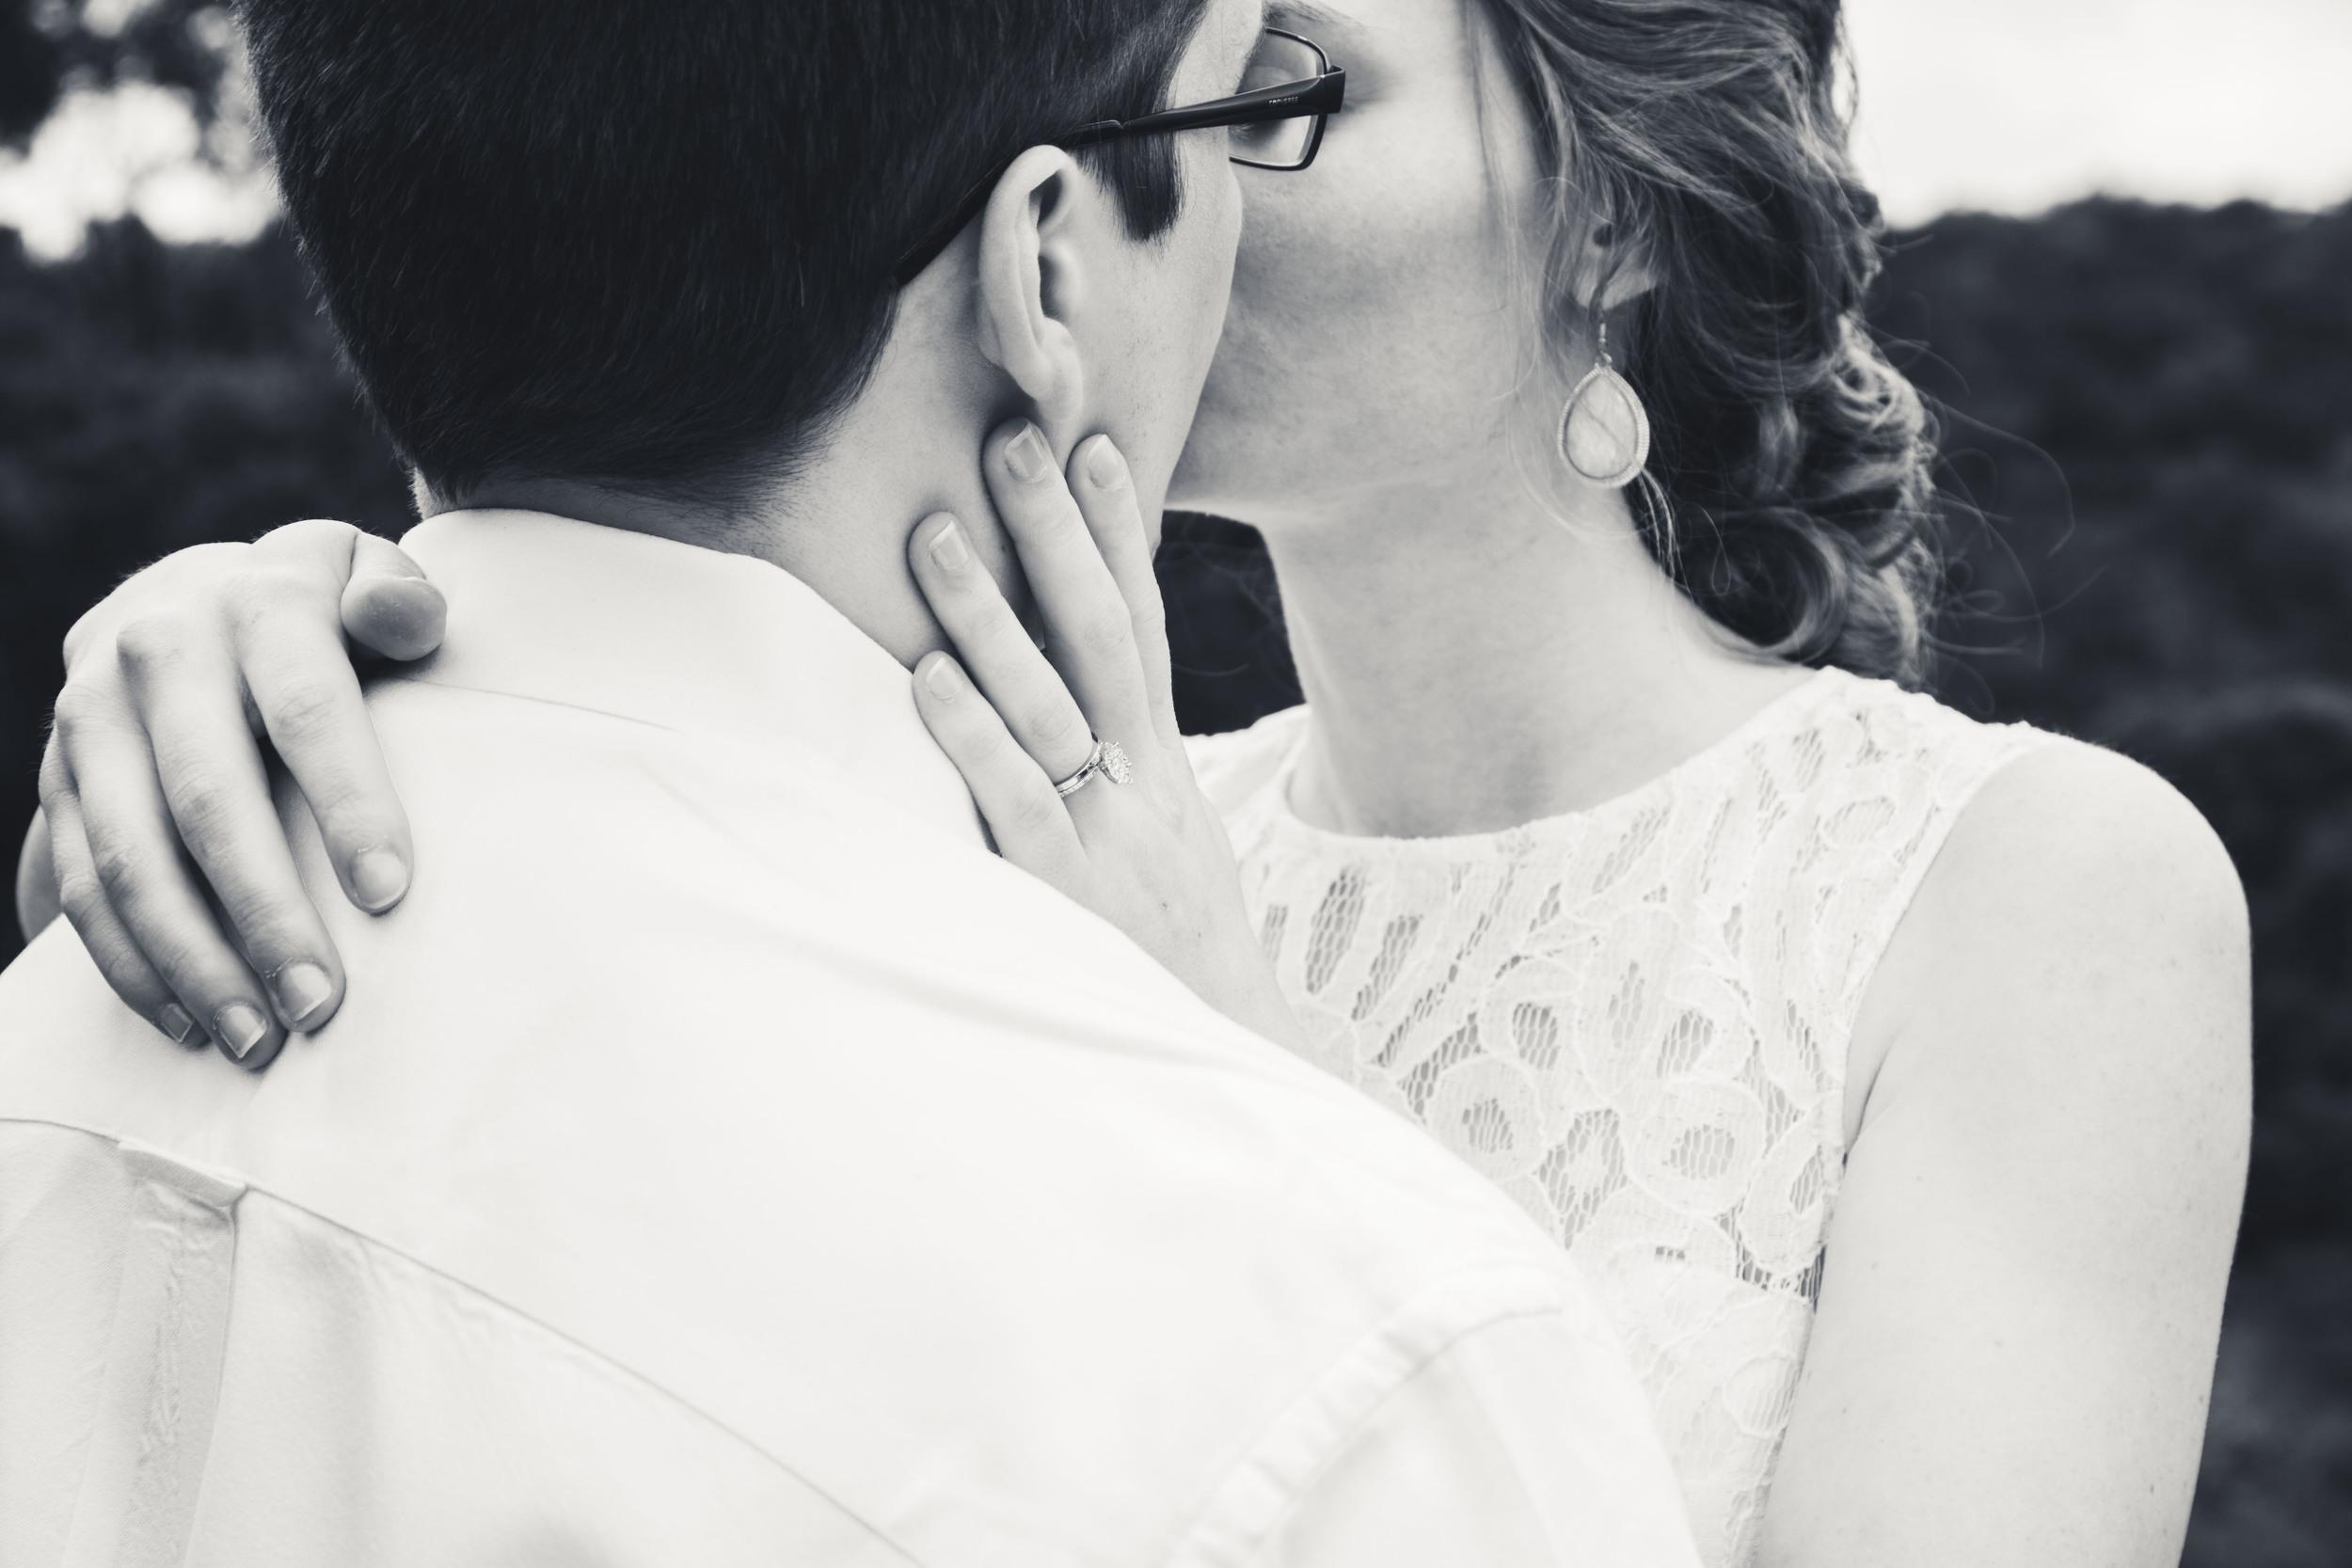 ATGI_Nicole & Patrick Wedding_2016_2S8A6543.jpg